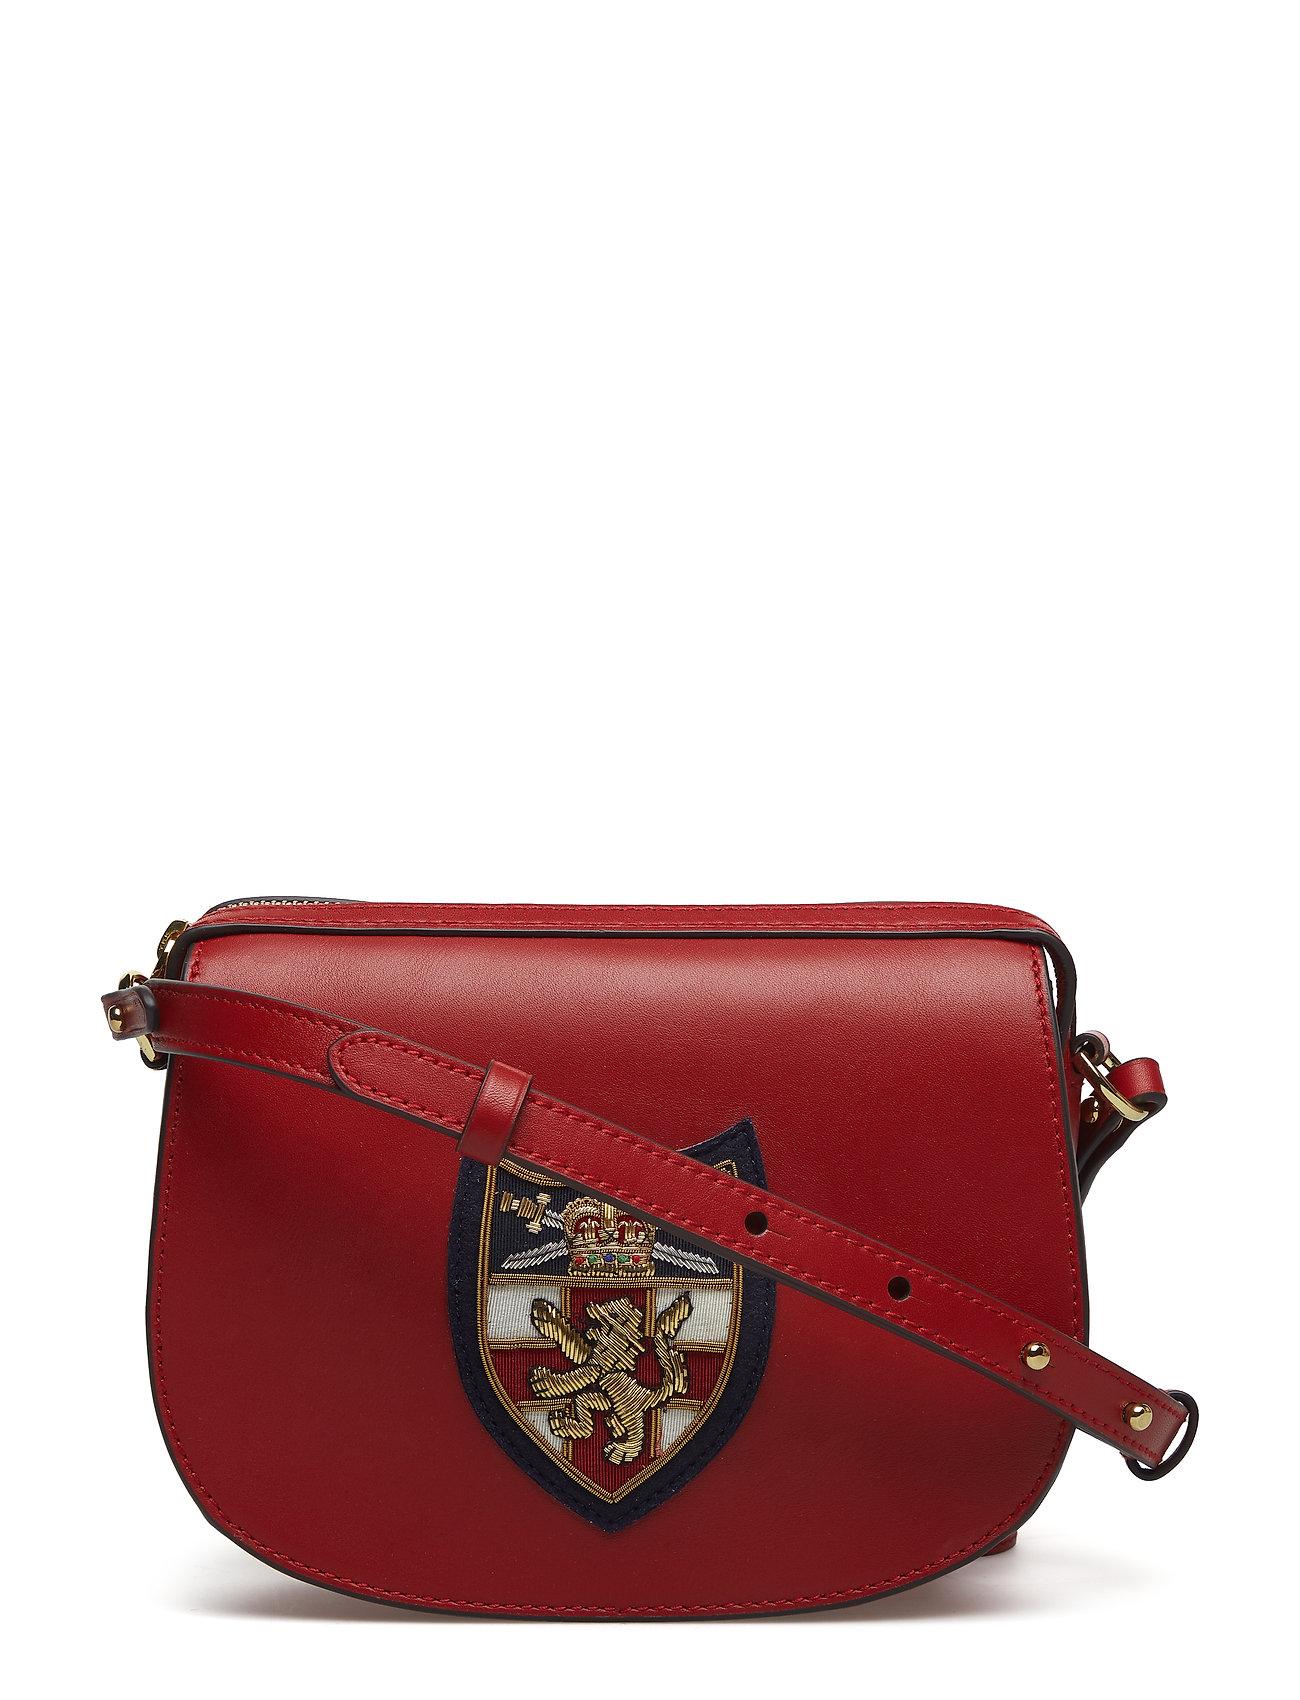 Smth Lthr Gold Crst-bul Mini Bag-cx (Scarlet) (1899 kr) - Polo Ralph ... 557397852fe90